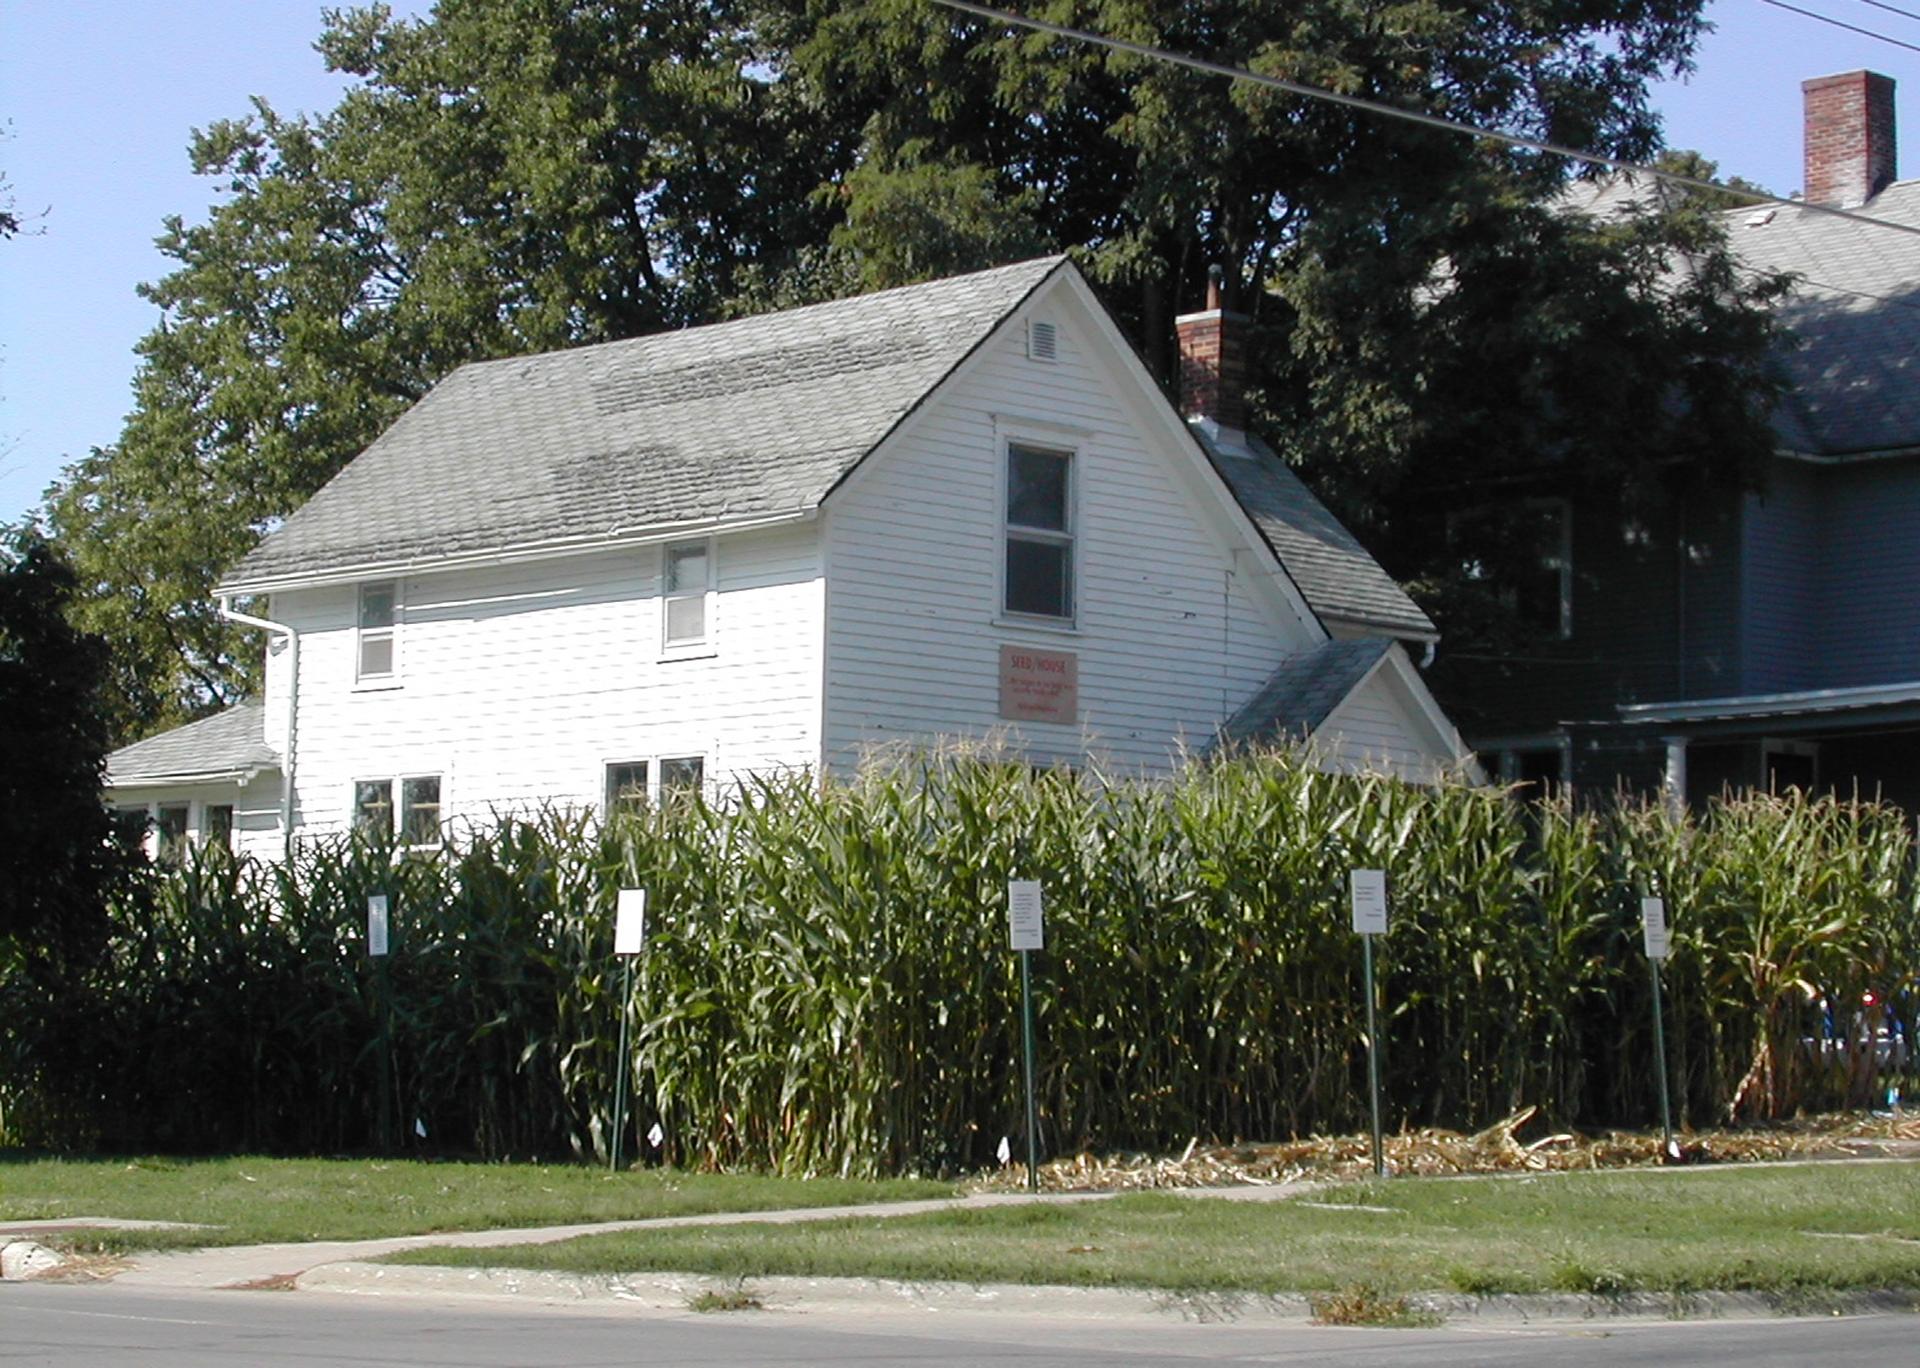 Seed/House, 2003